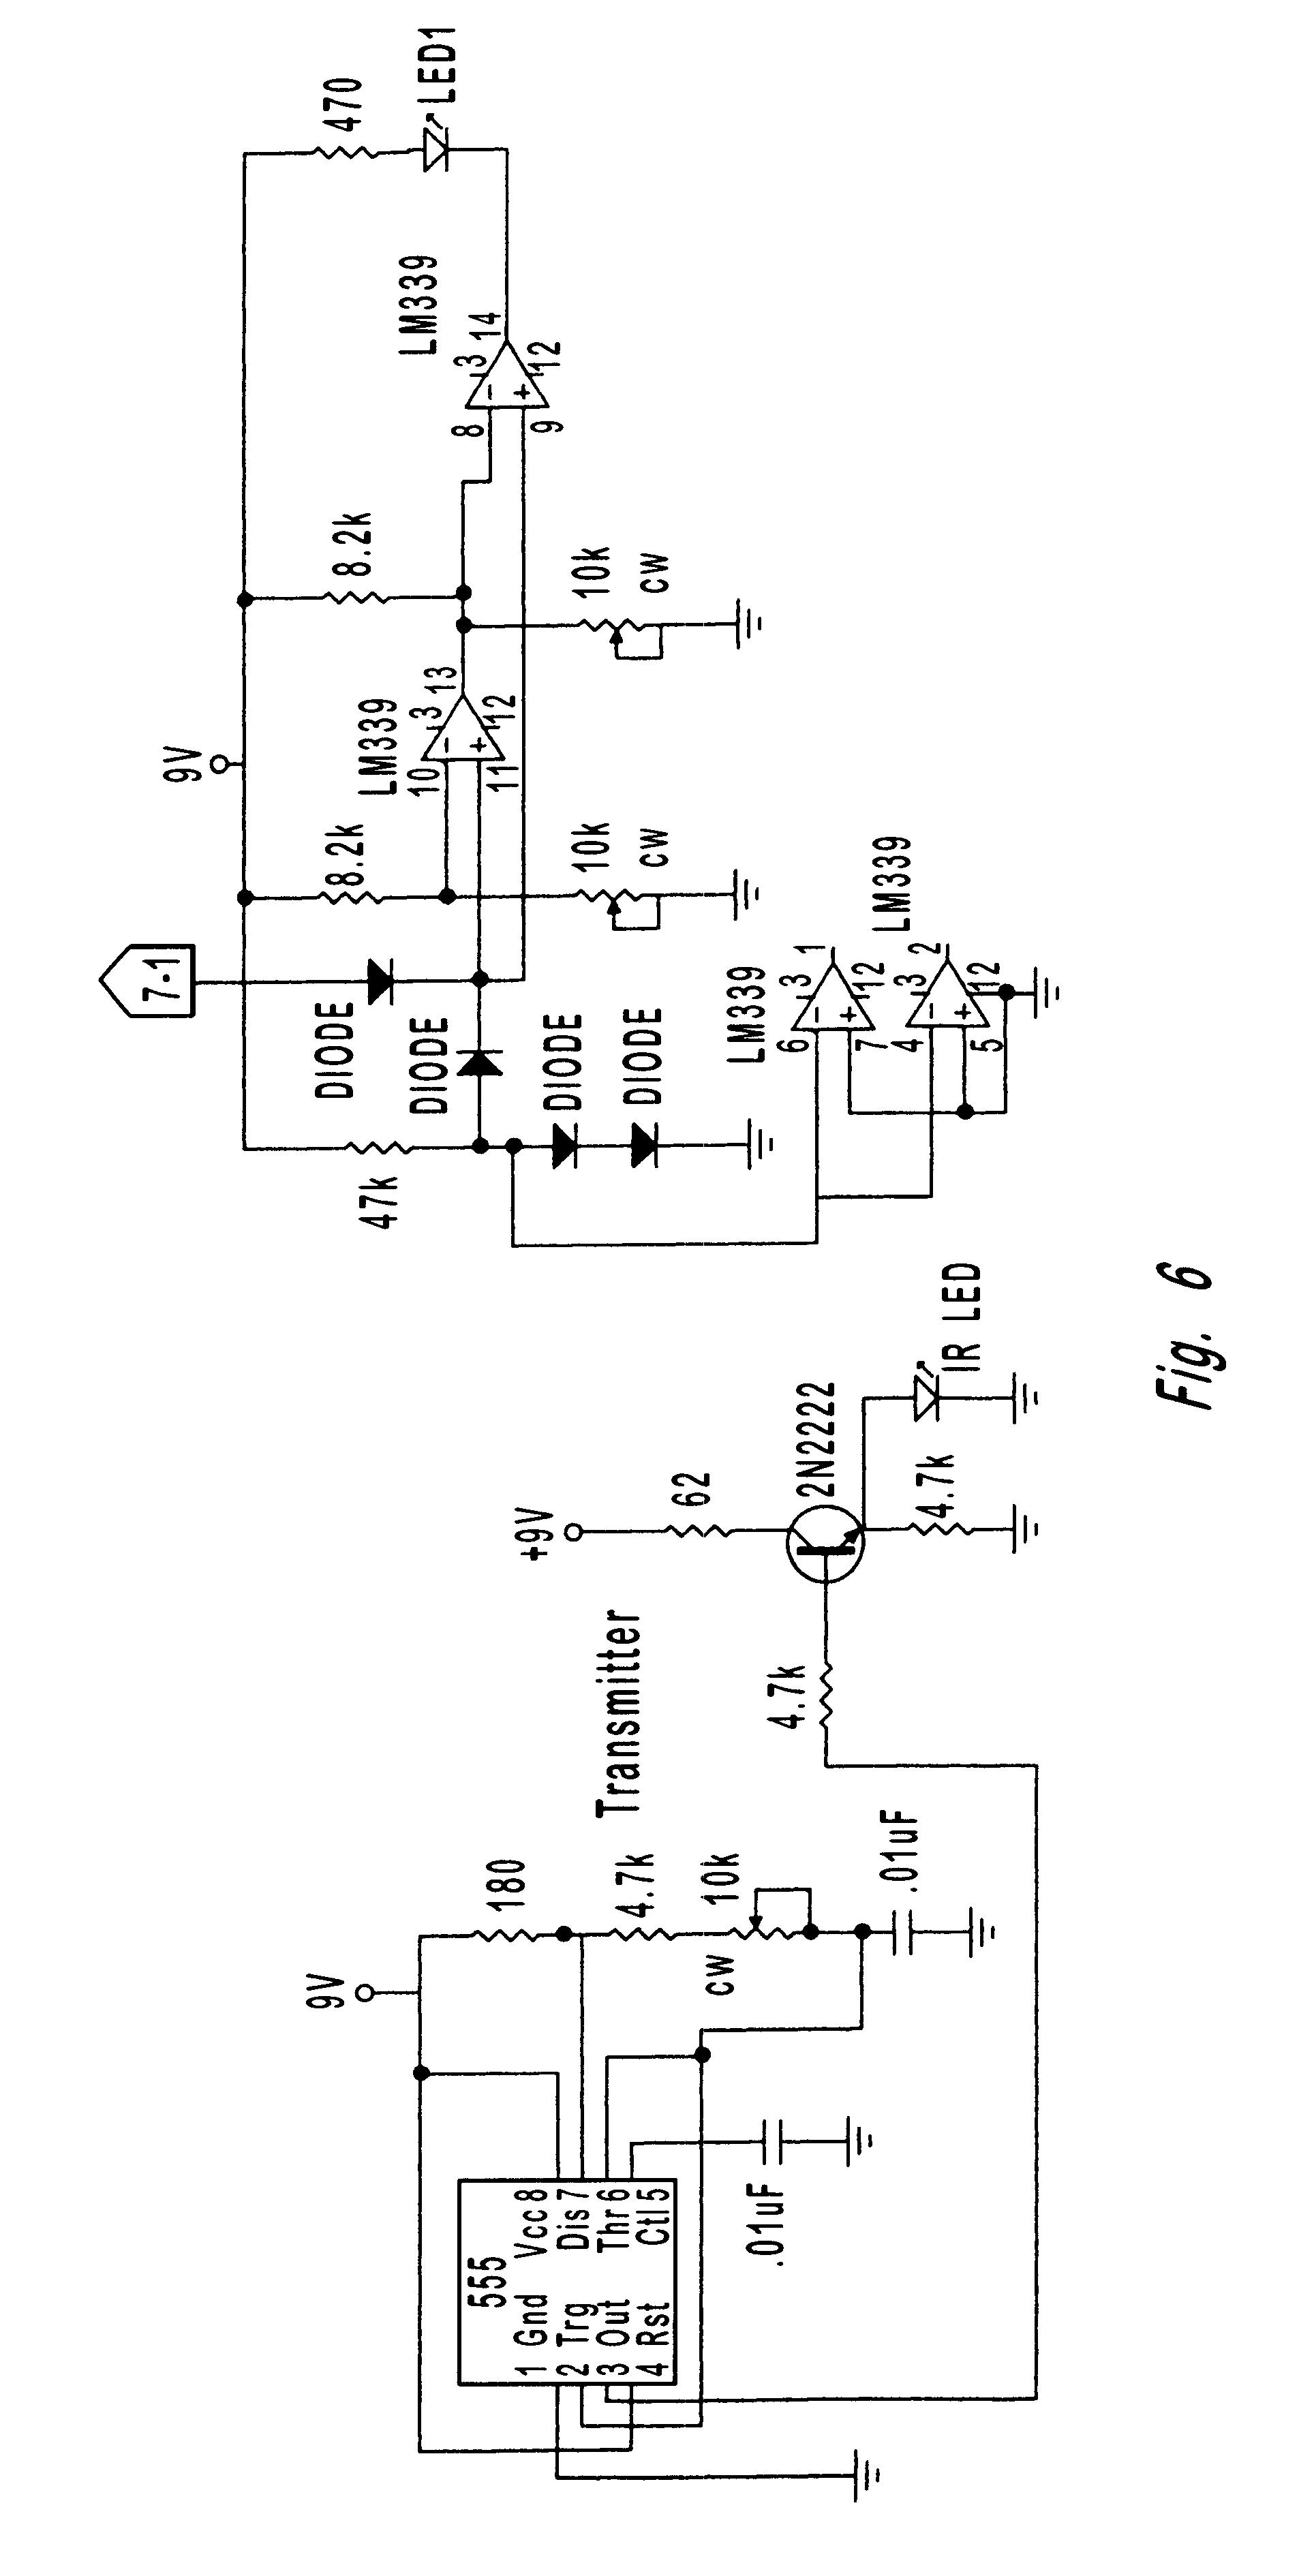 Patent Us 6483929 B1 Lm339 Circuit Diagram 0 Petitions